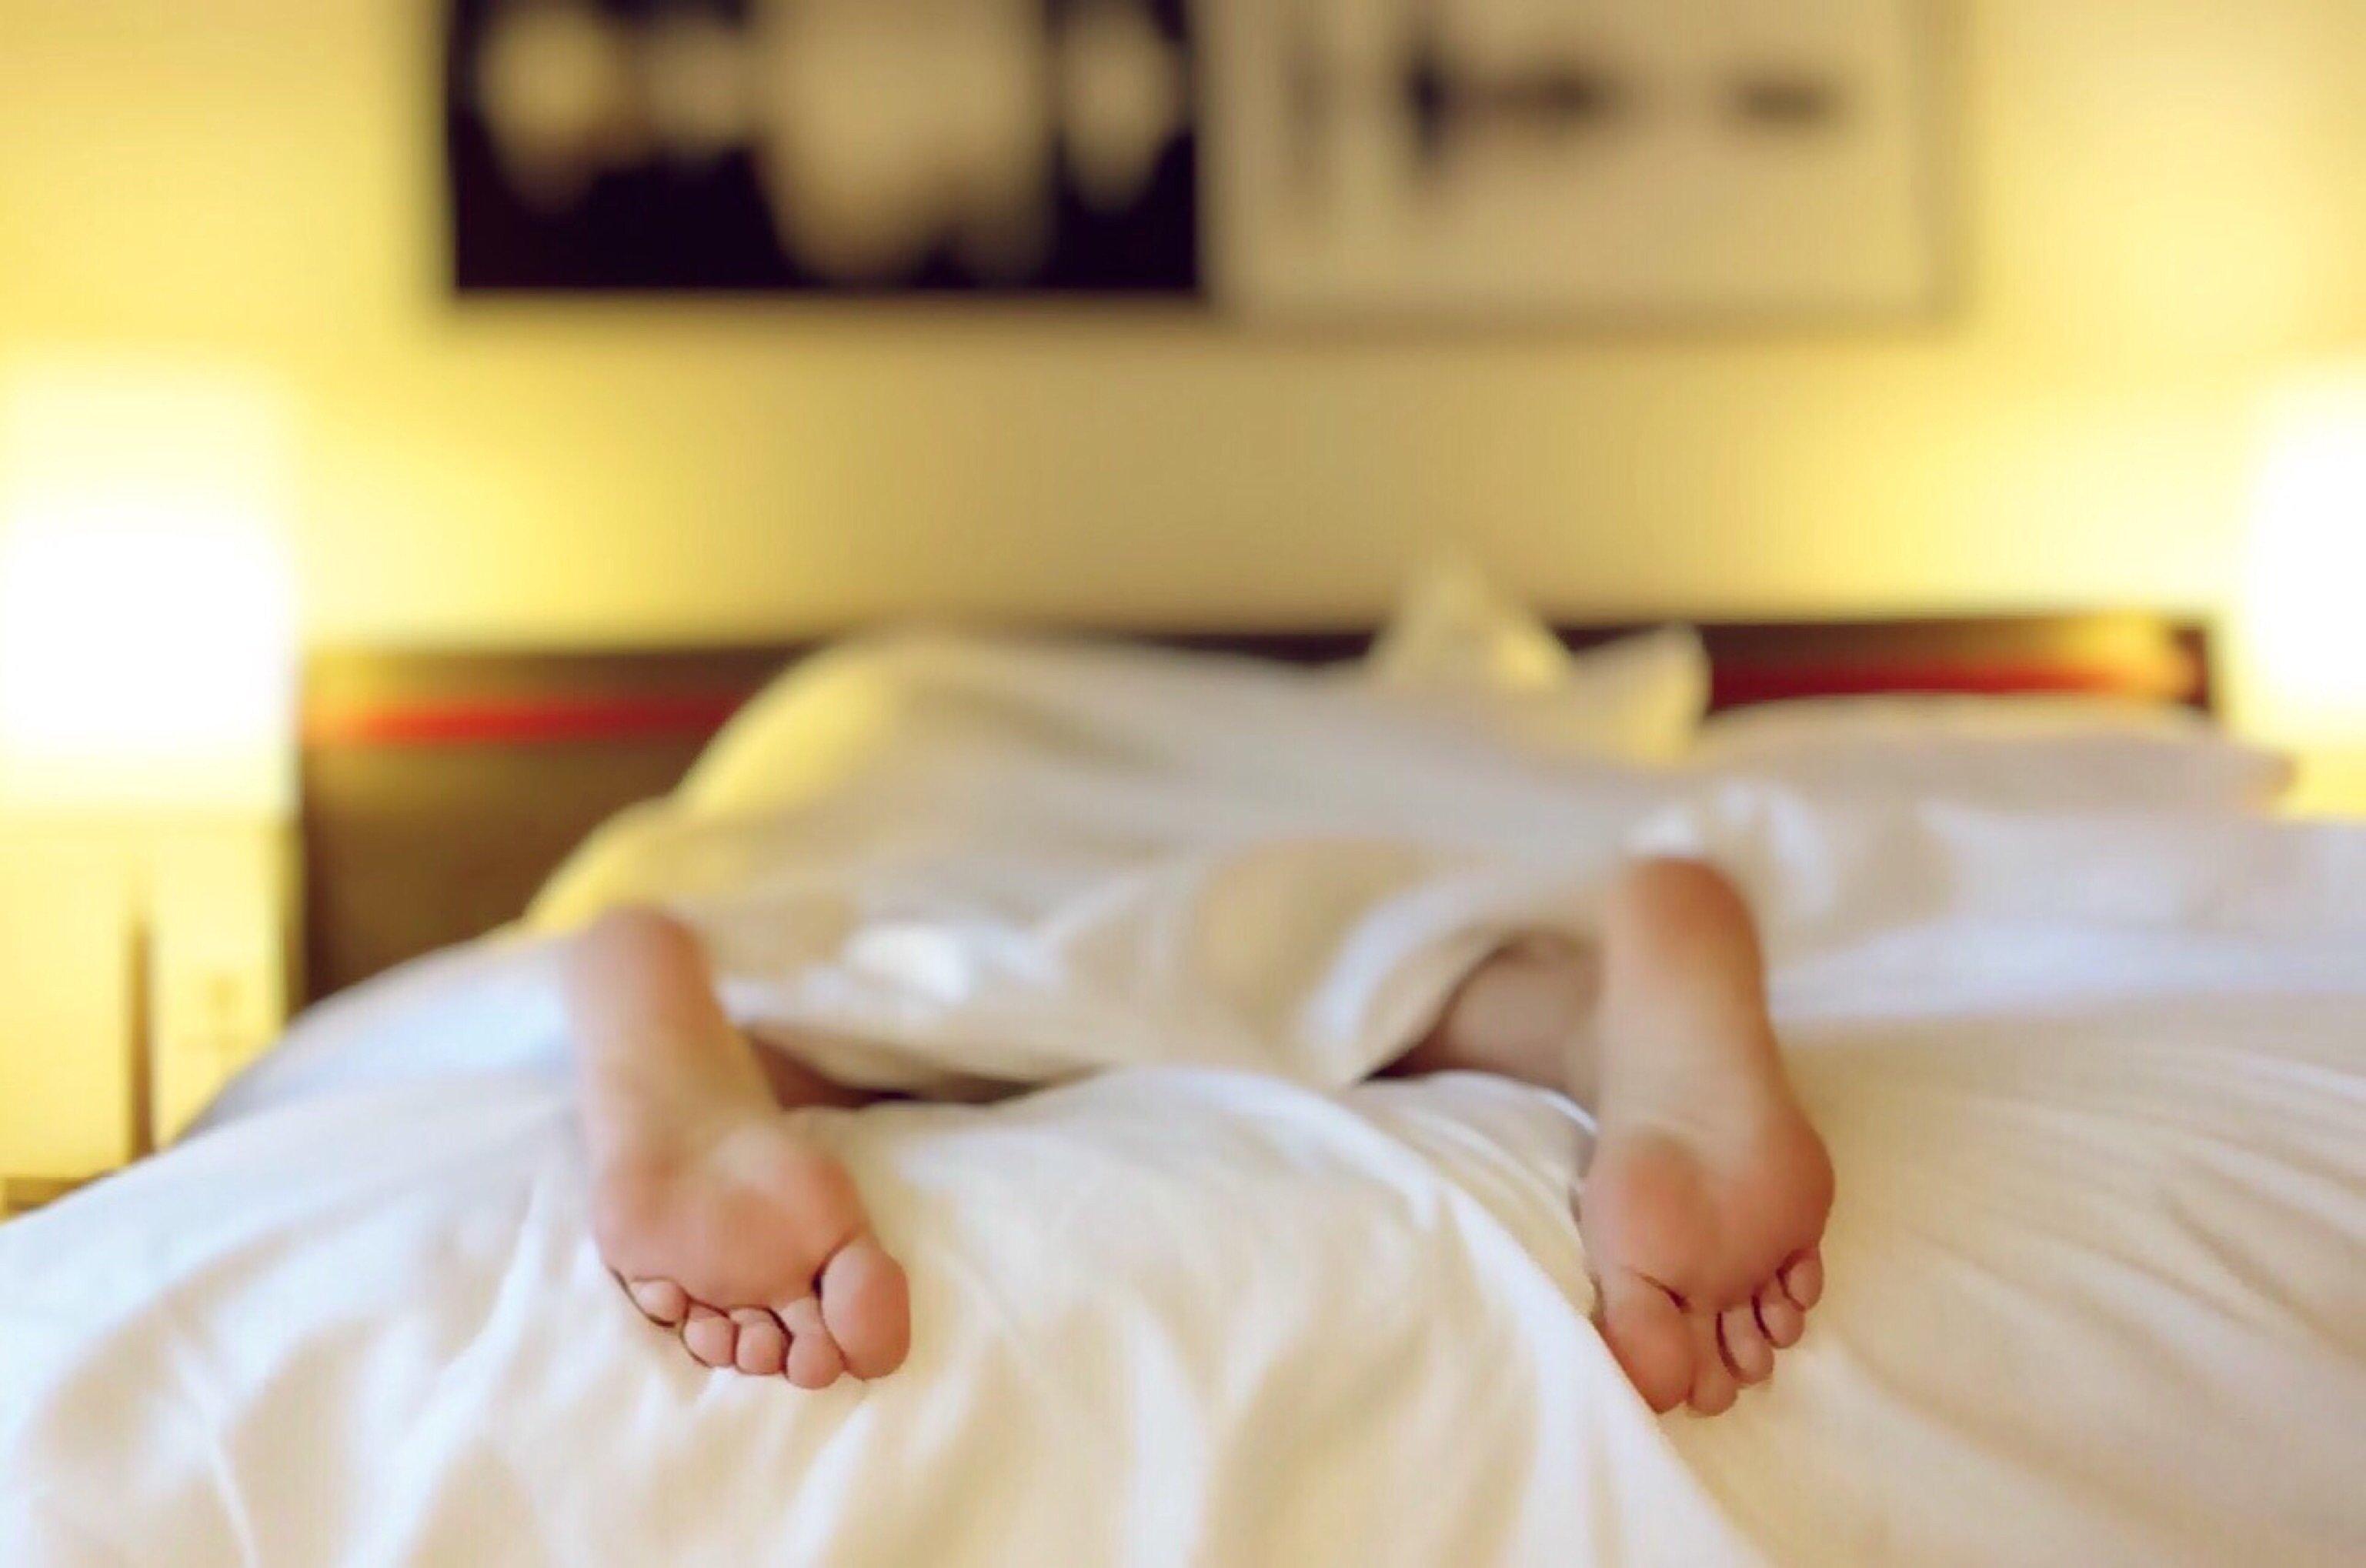 Смешные картинки лежа на кровати